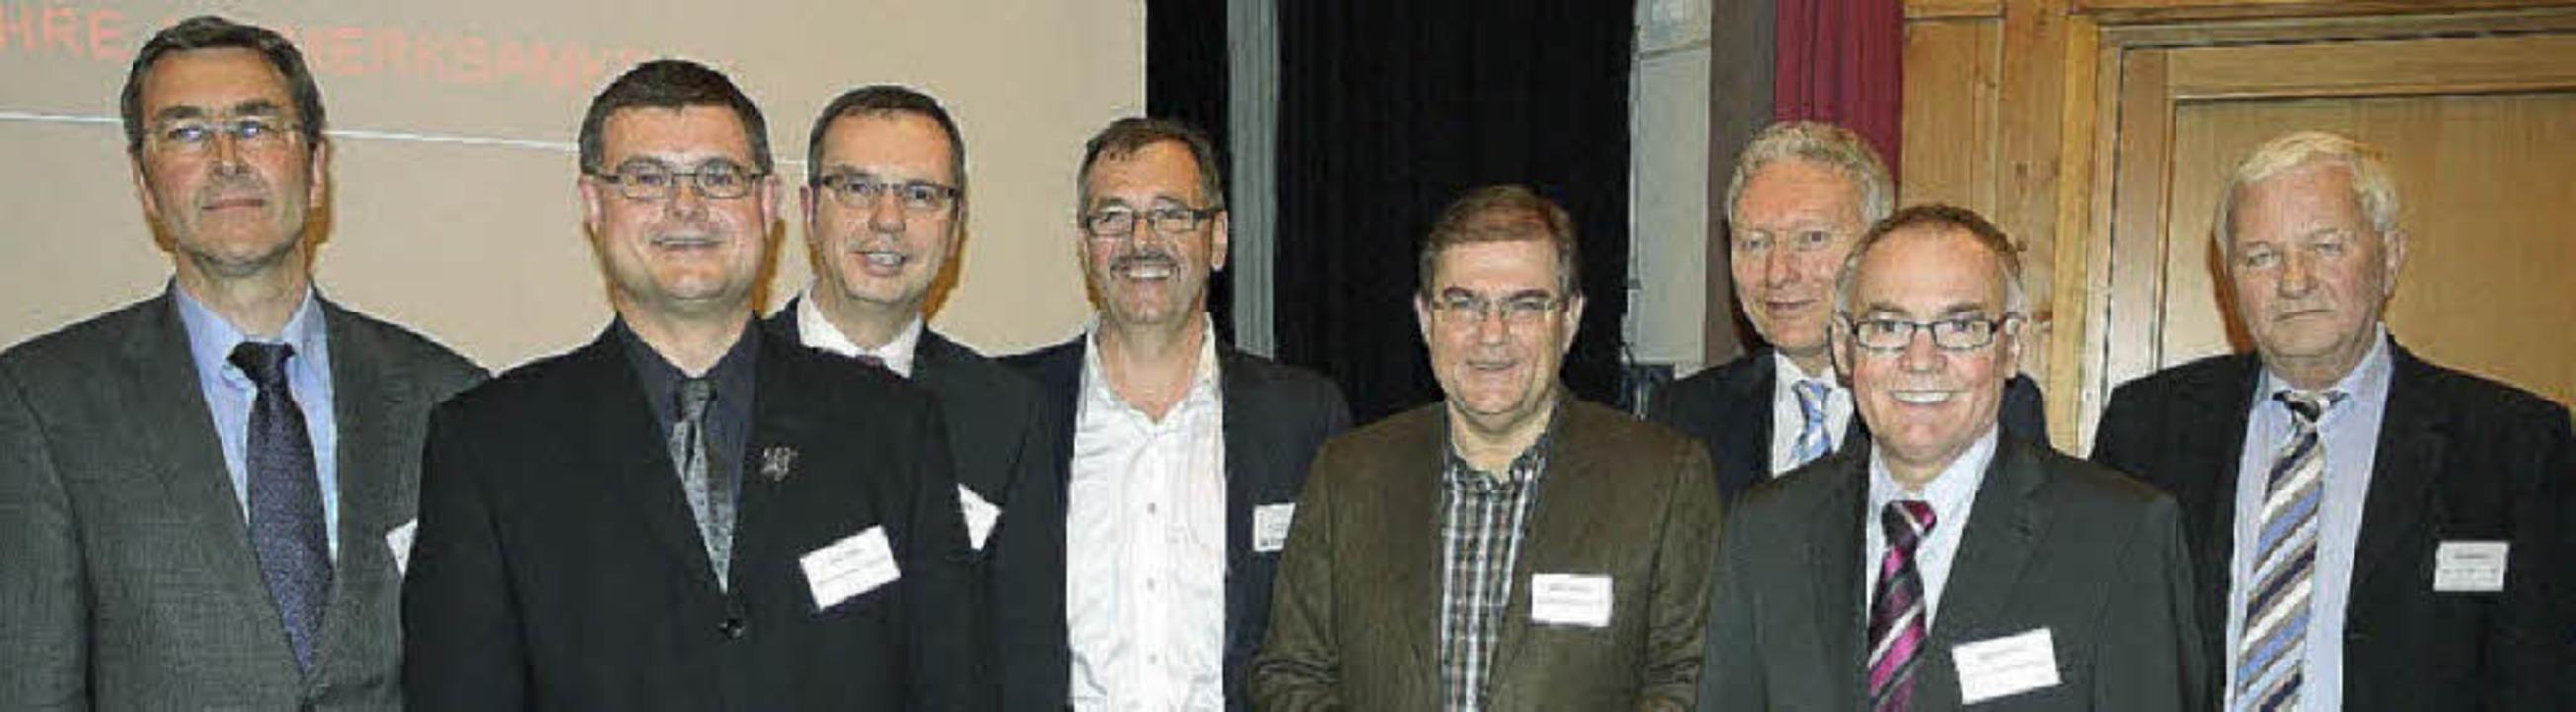 Referenten beim Bleibacher Baugespräch... Stratz und Moderator Jörg Hemmerich.   | Foto:  Eberhard Weiss